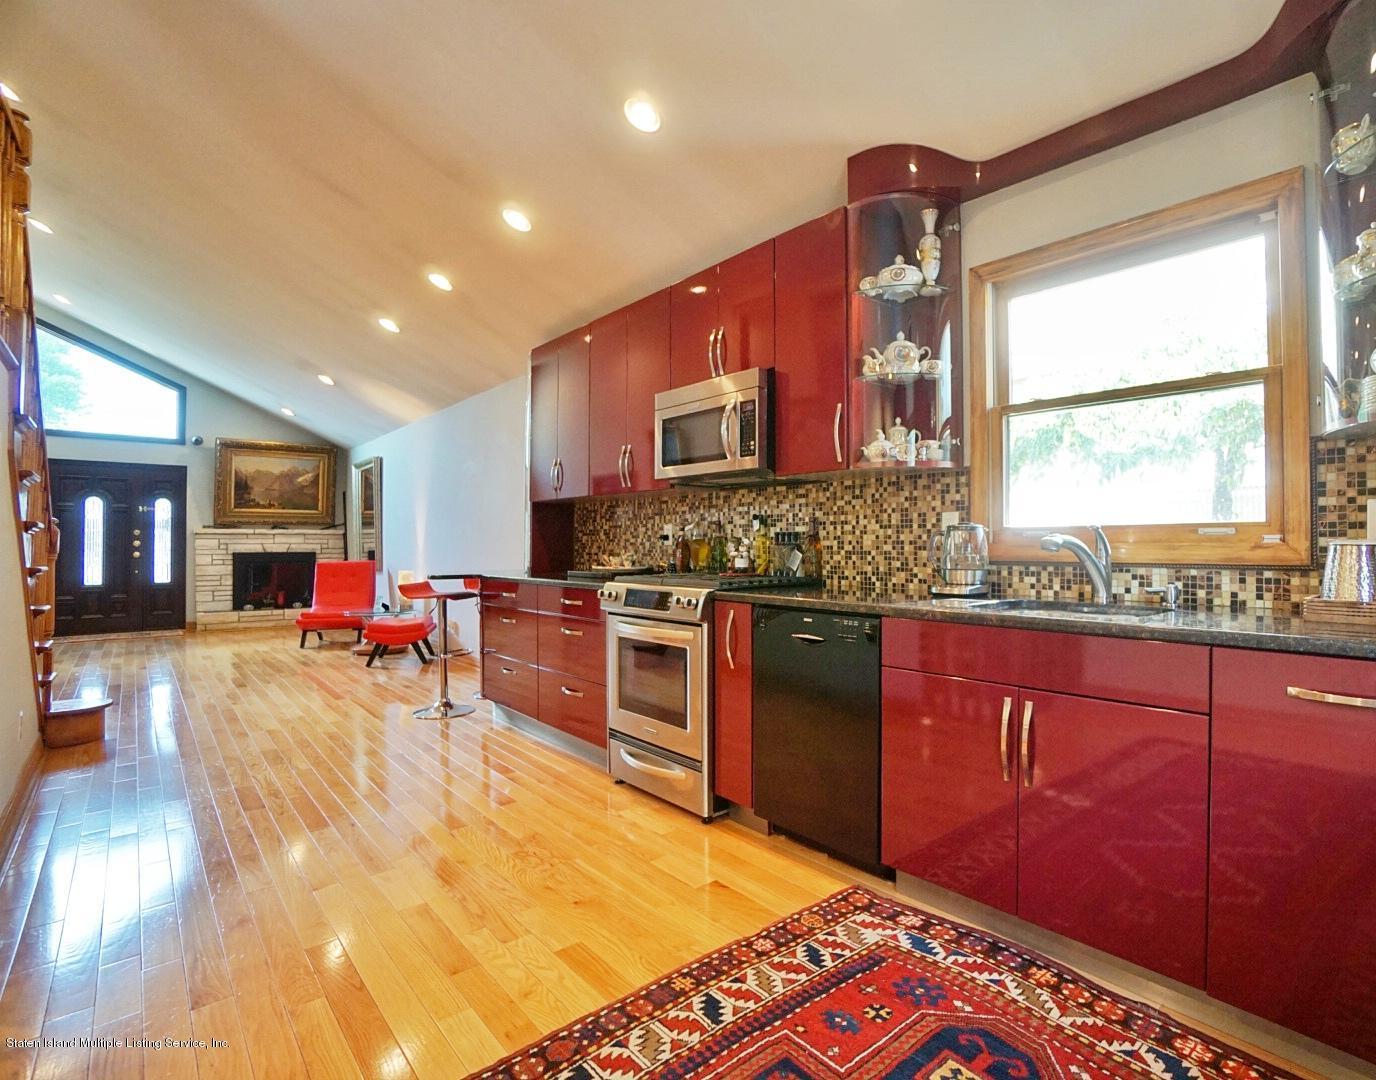 Single Family - Detached 48 Ocean Terrace  Staten Island, NY 10314, MLS-1130826-21